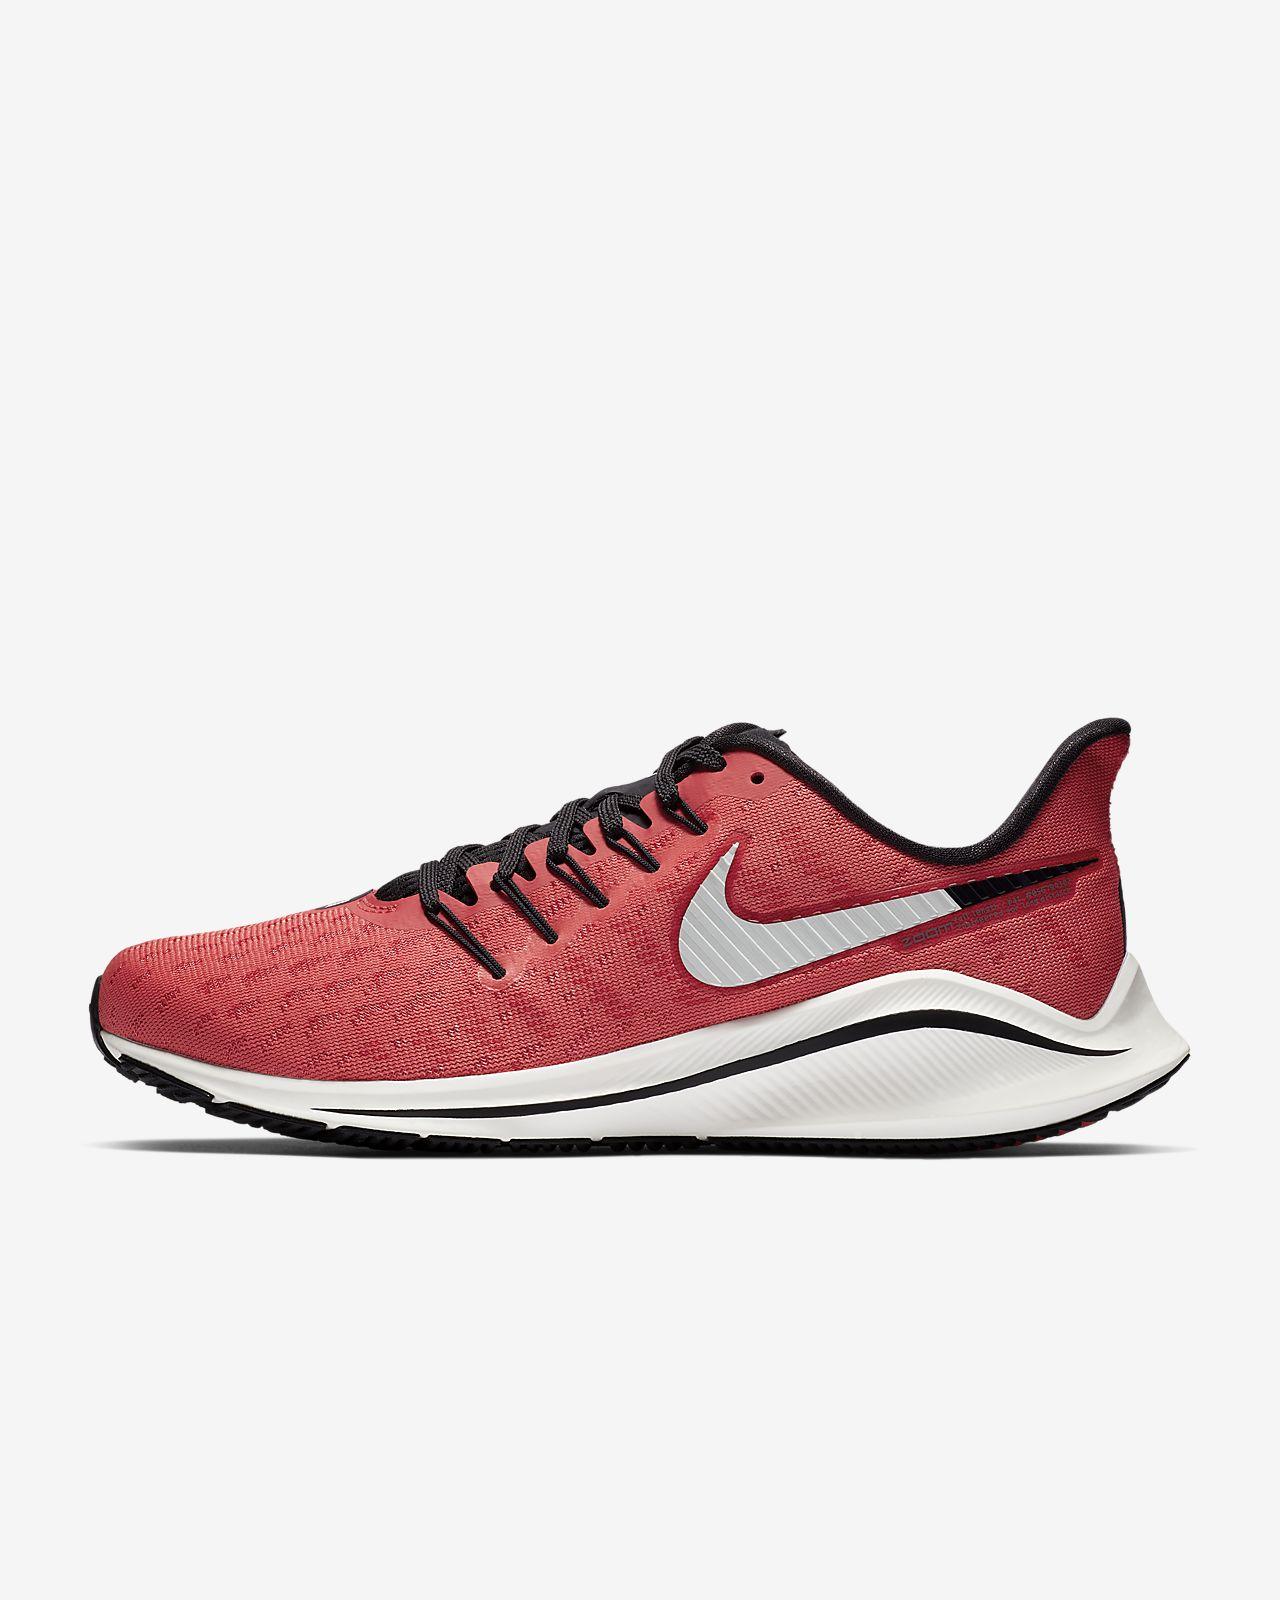 17afa73db7 Nike Air Zoom Vomero 14 női futócipő. Nike.com HU